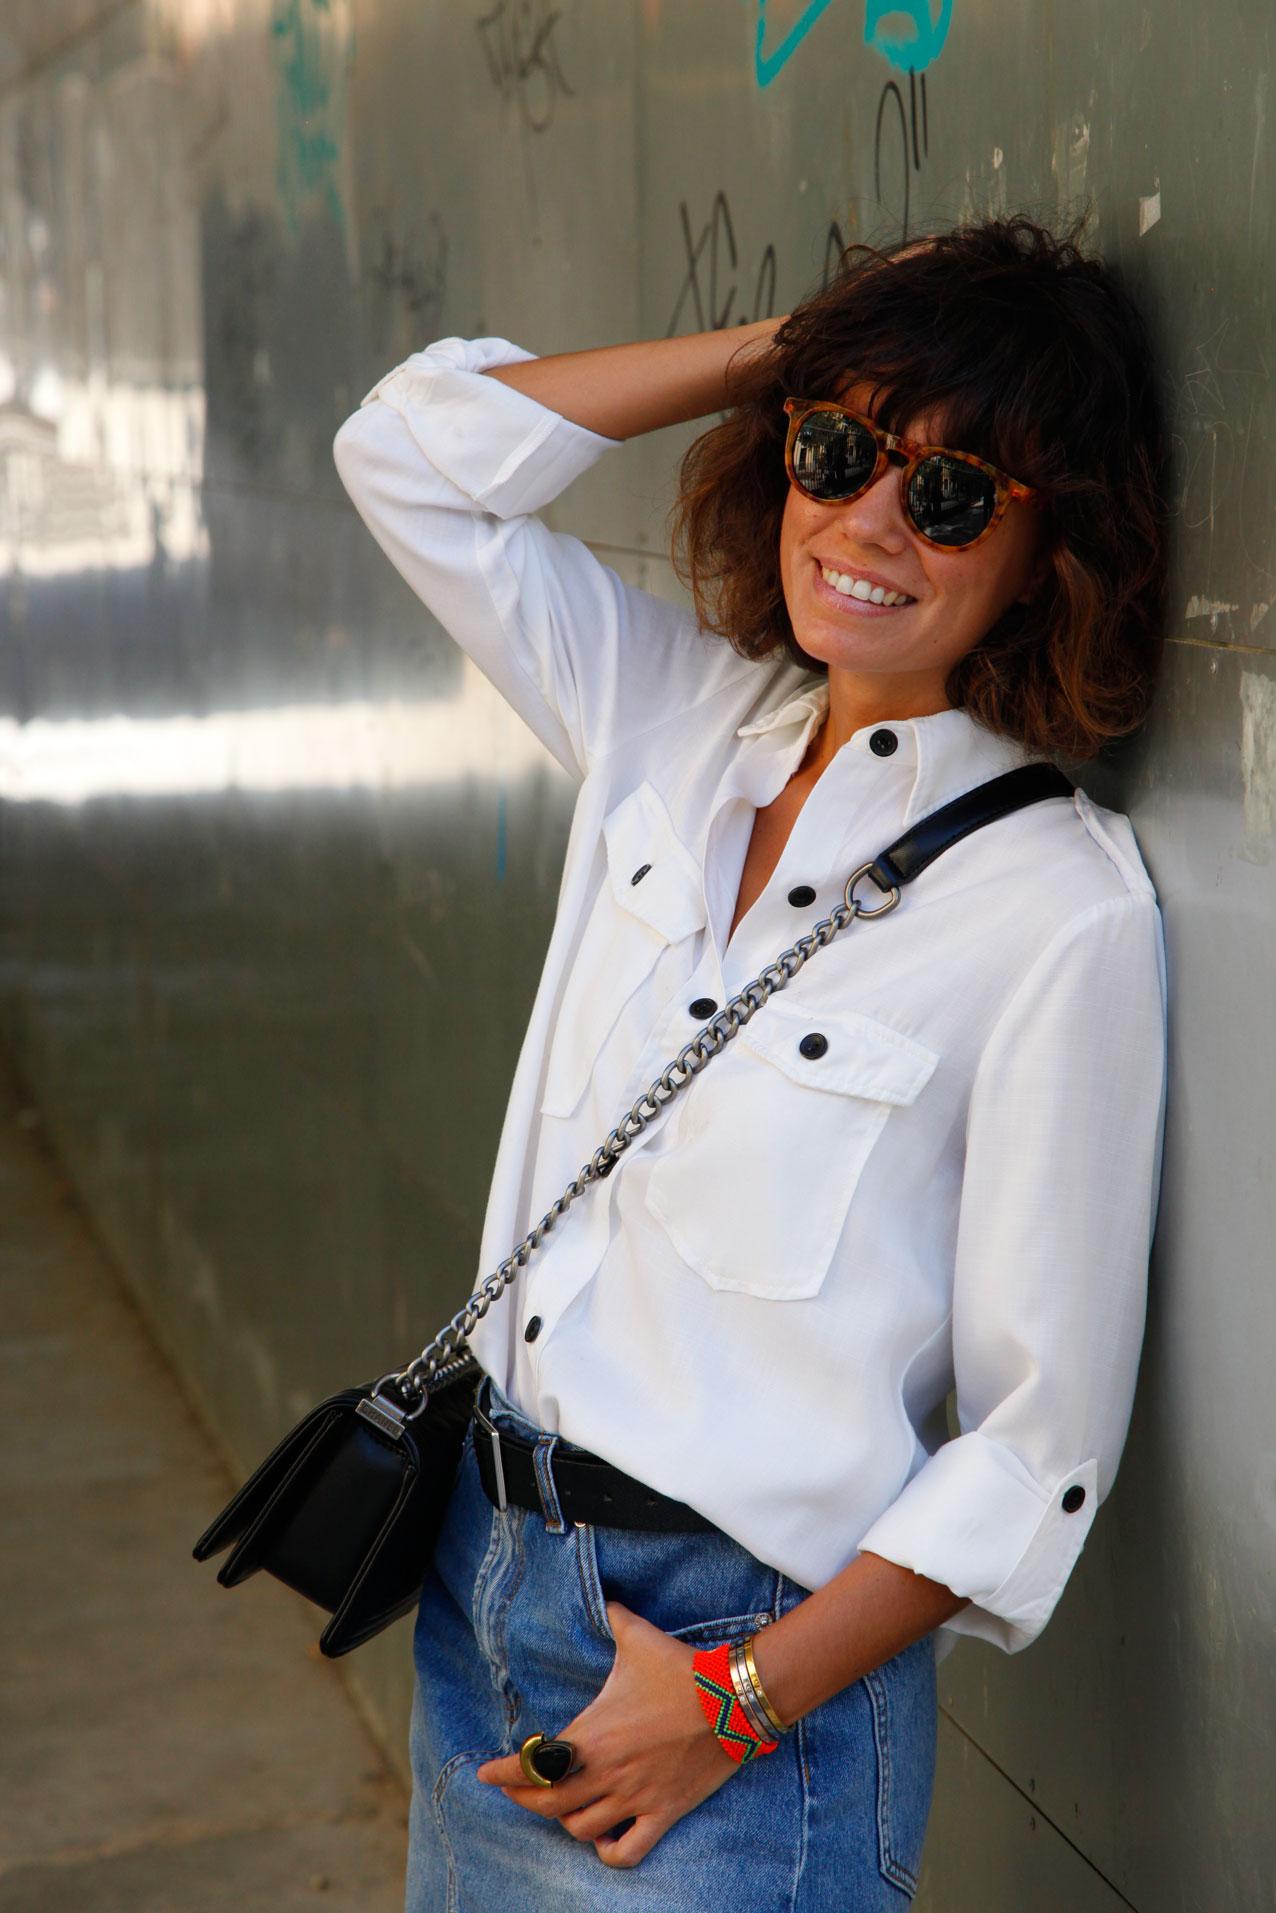 gucci_slippers_adn_denim_skirt_look-cool_lemonade7